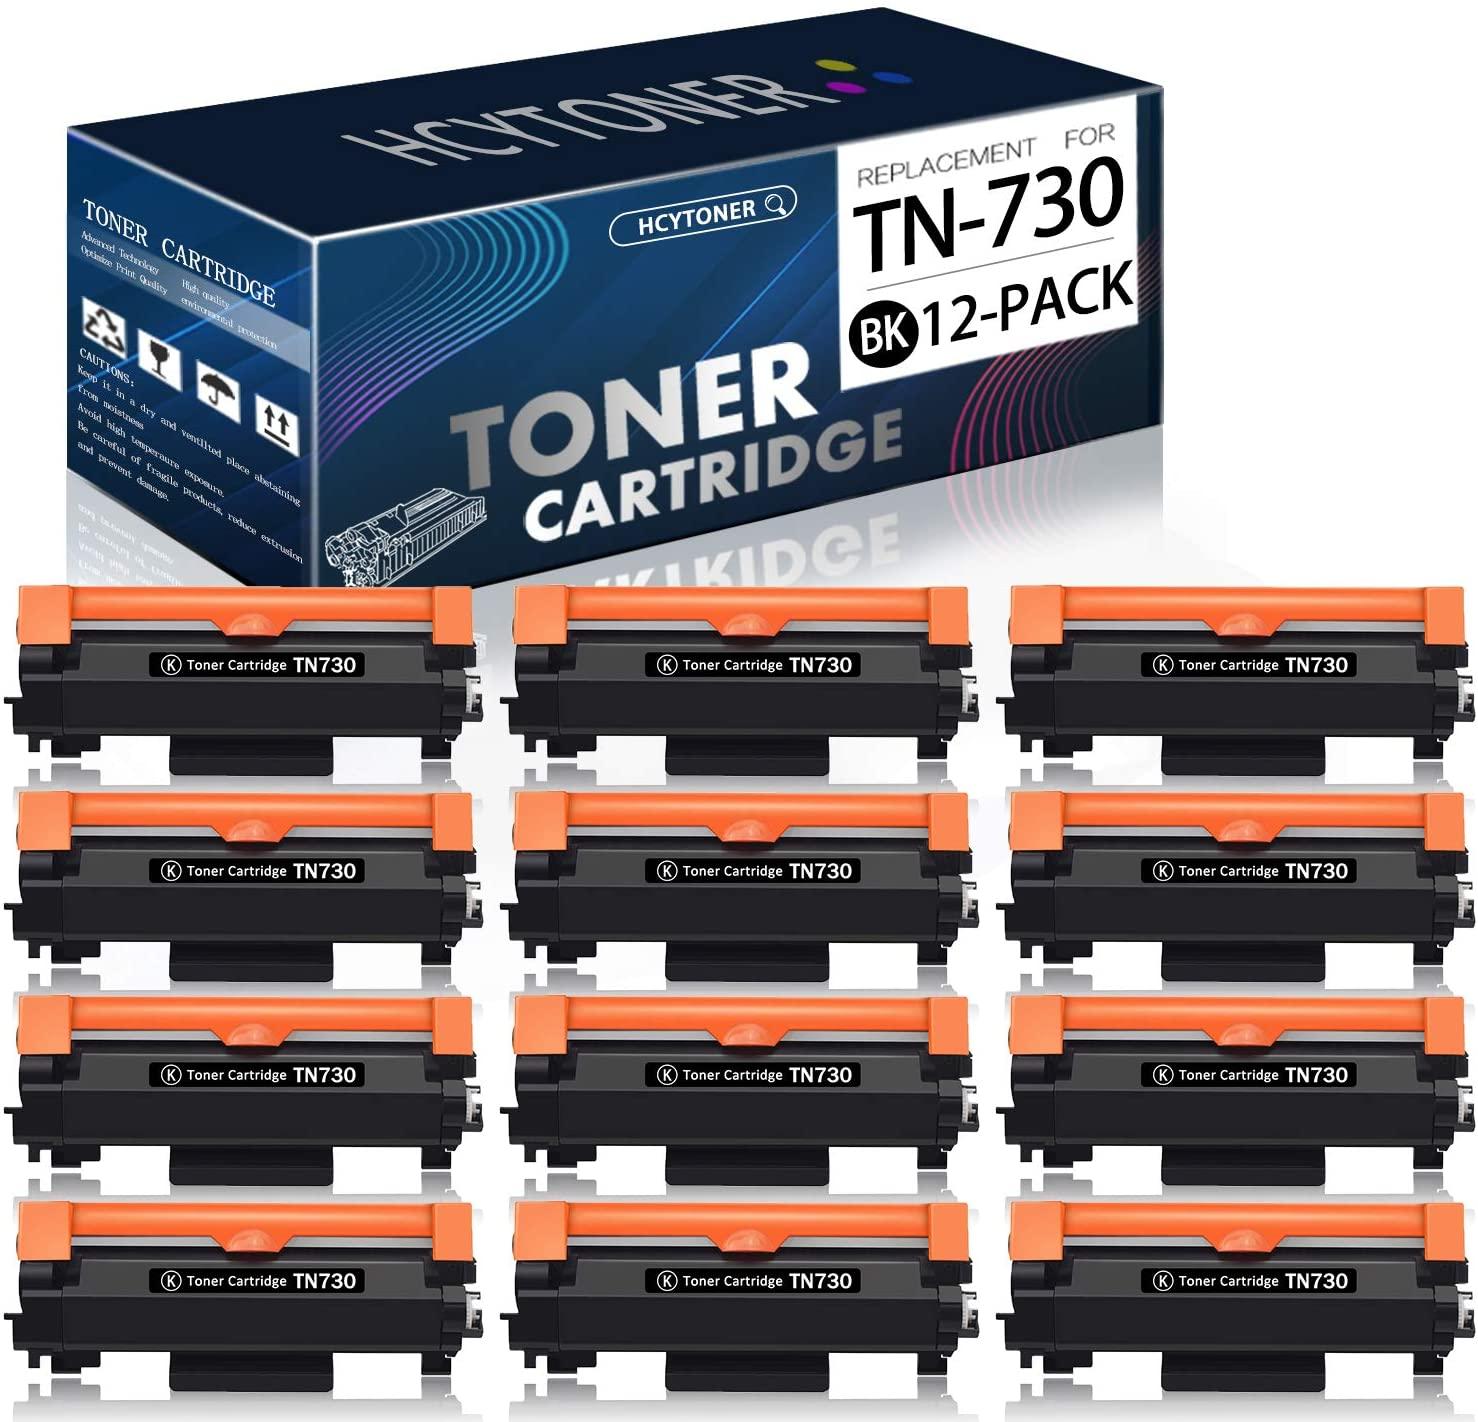 (12-Pack,Black) TN730 TN-730 Toner Cartridge Replacement for Brother Cartridge TN730 Toner Compatible DCP-L2550DW MFC-L2710DW L2750DW L2750DWXL HL-L2350DW L2370DW/DWXL HL-L2390DW L2395DW Printer